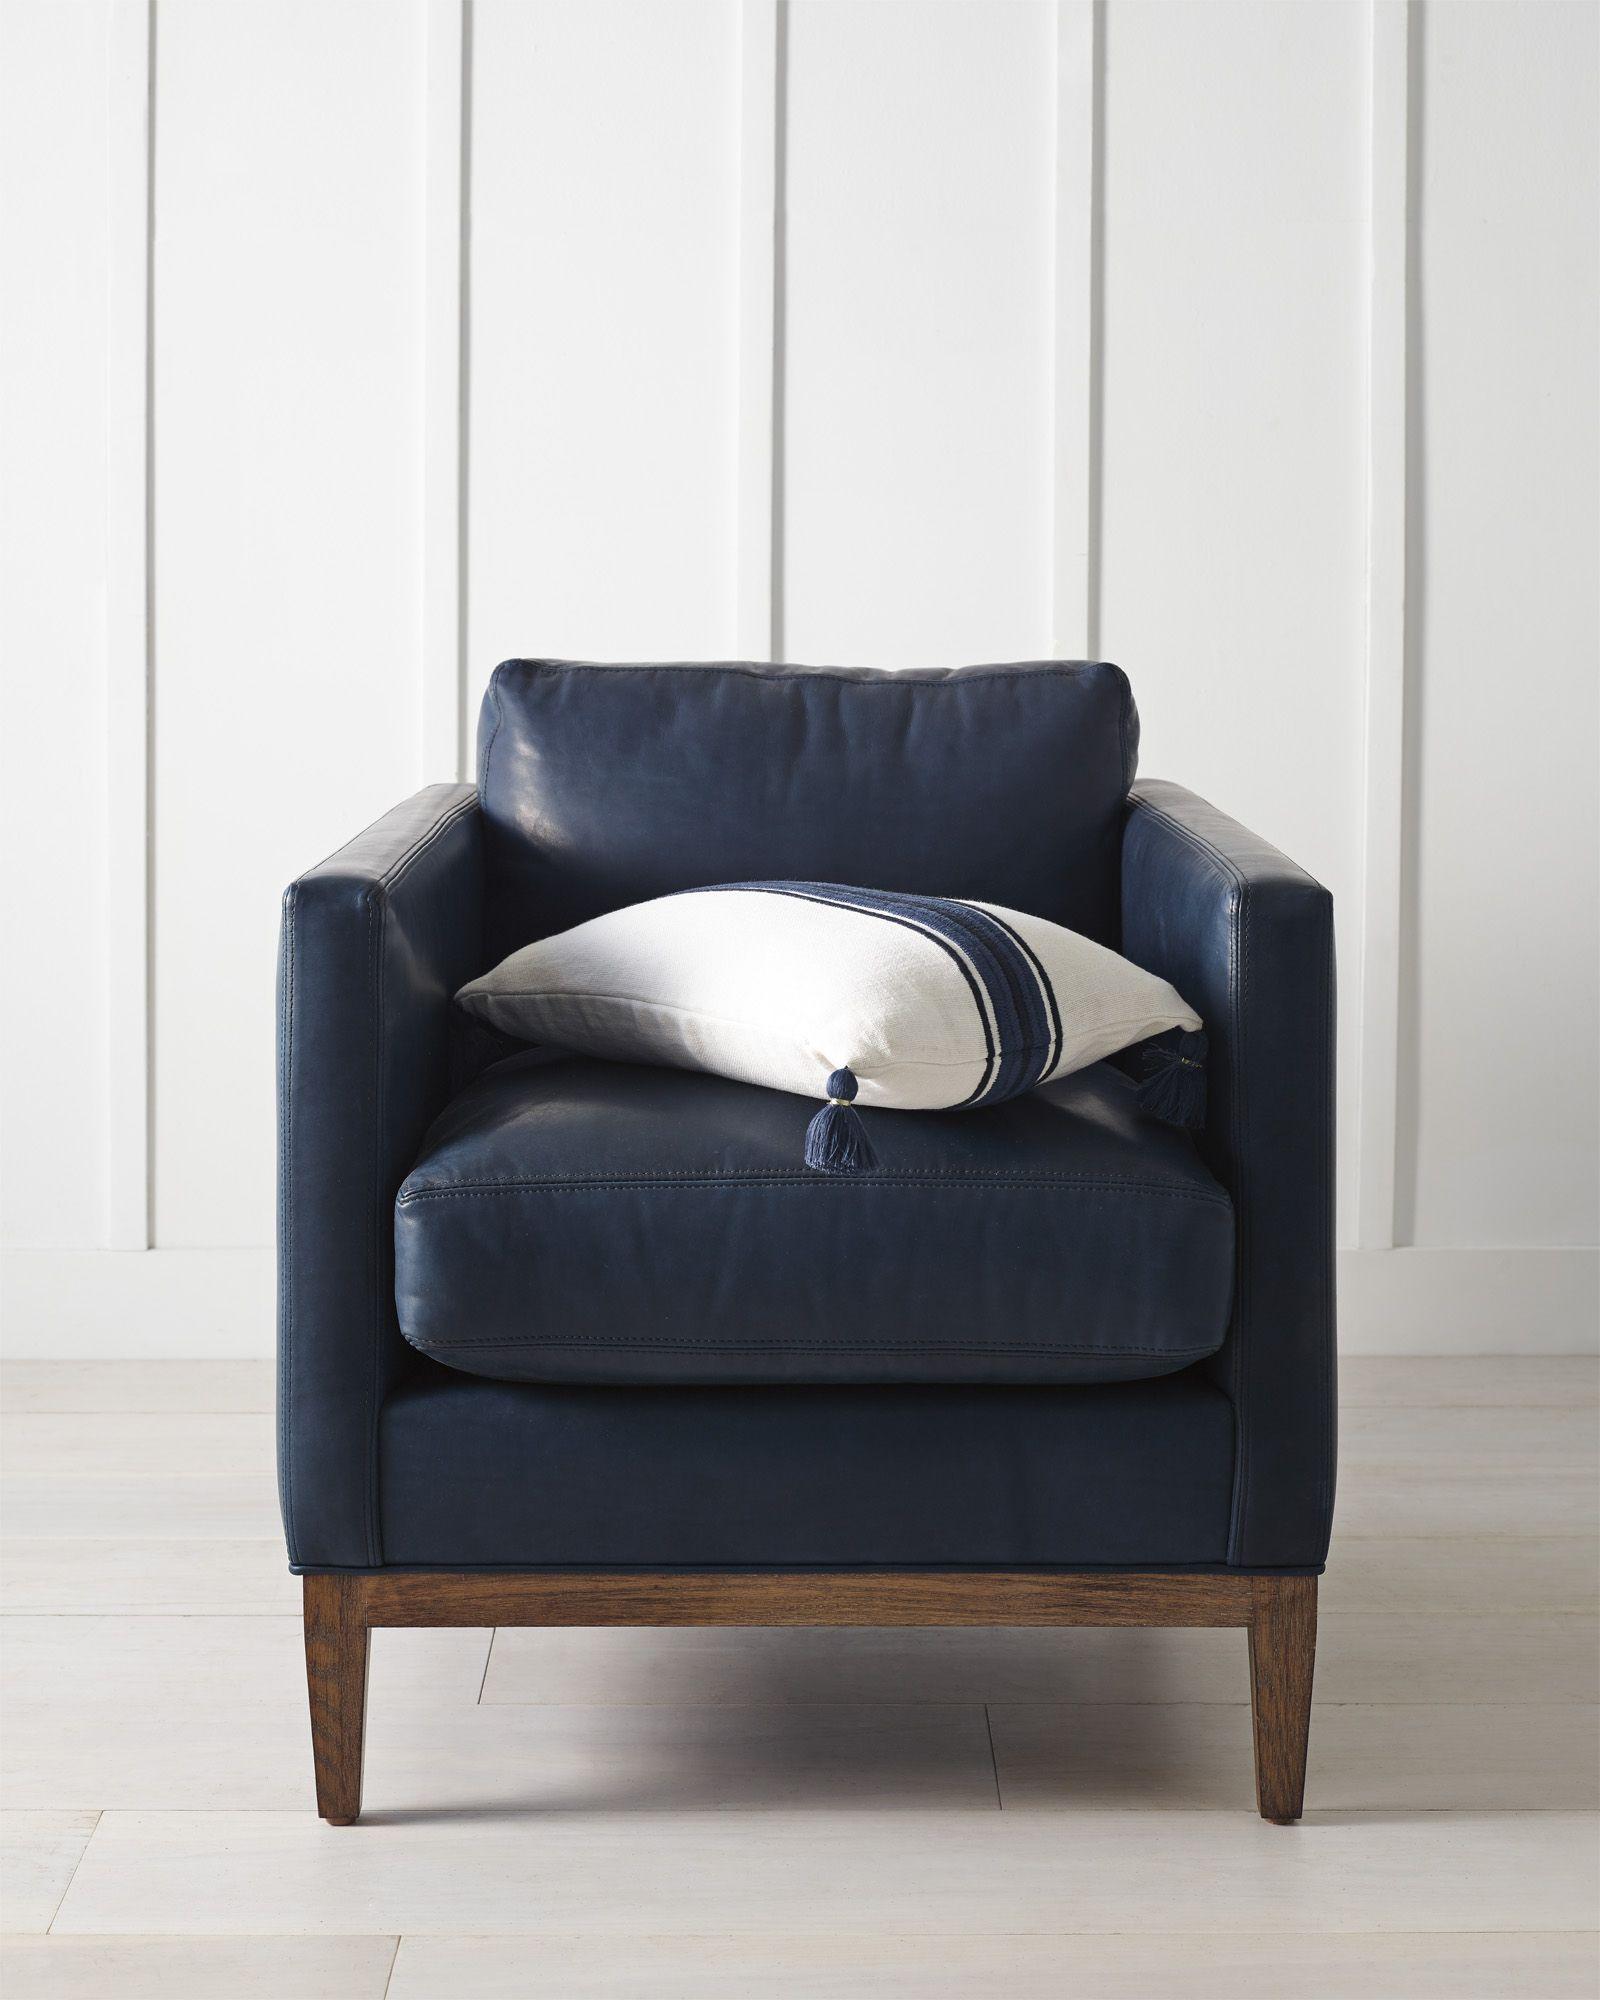 Barton chairbarton chair home pinterest sitting area and pillows